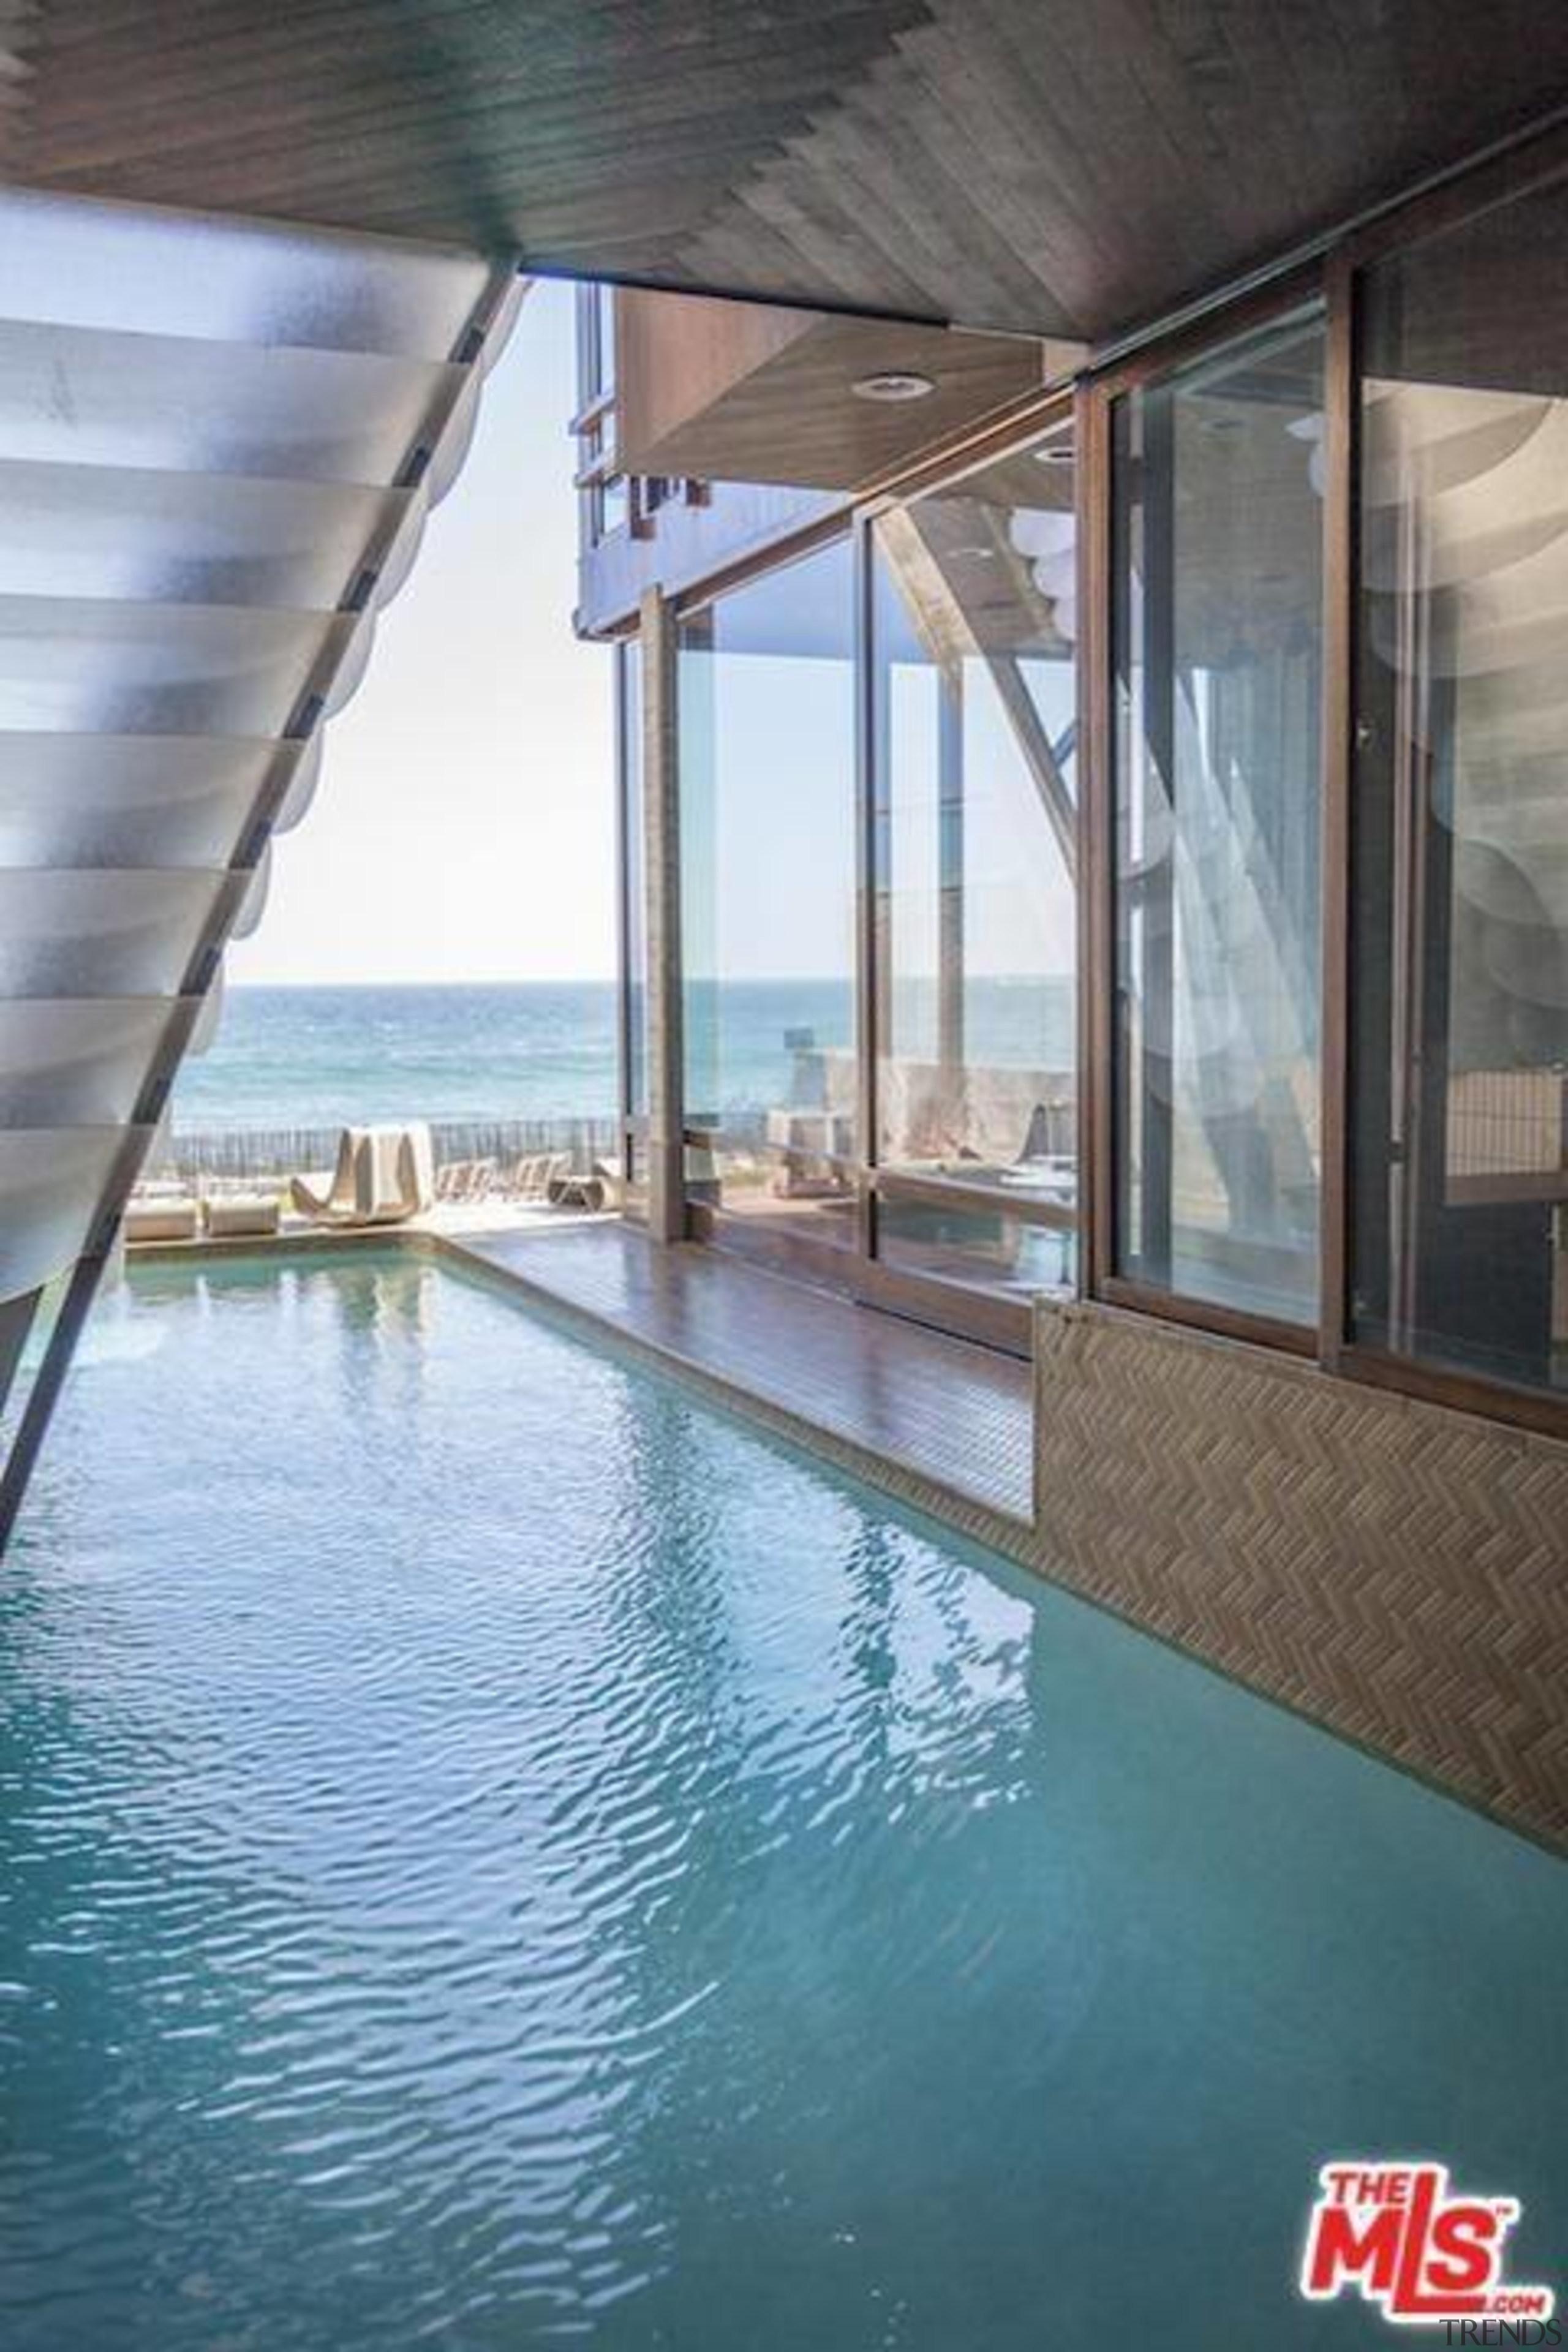 Edward Norton's new Malibu Colony home – Trulia condominium, daylighting, property, real estate, swimming pool, water, window, gray, teal